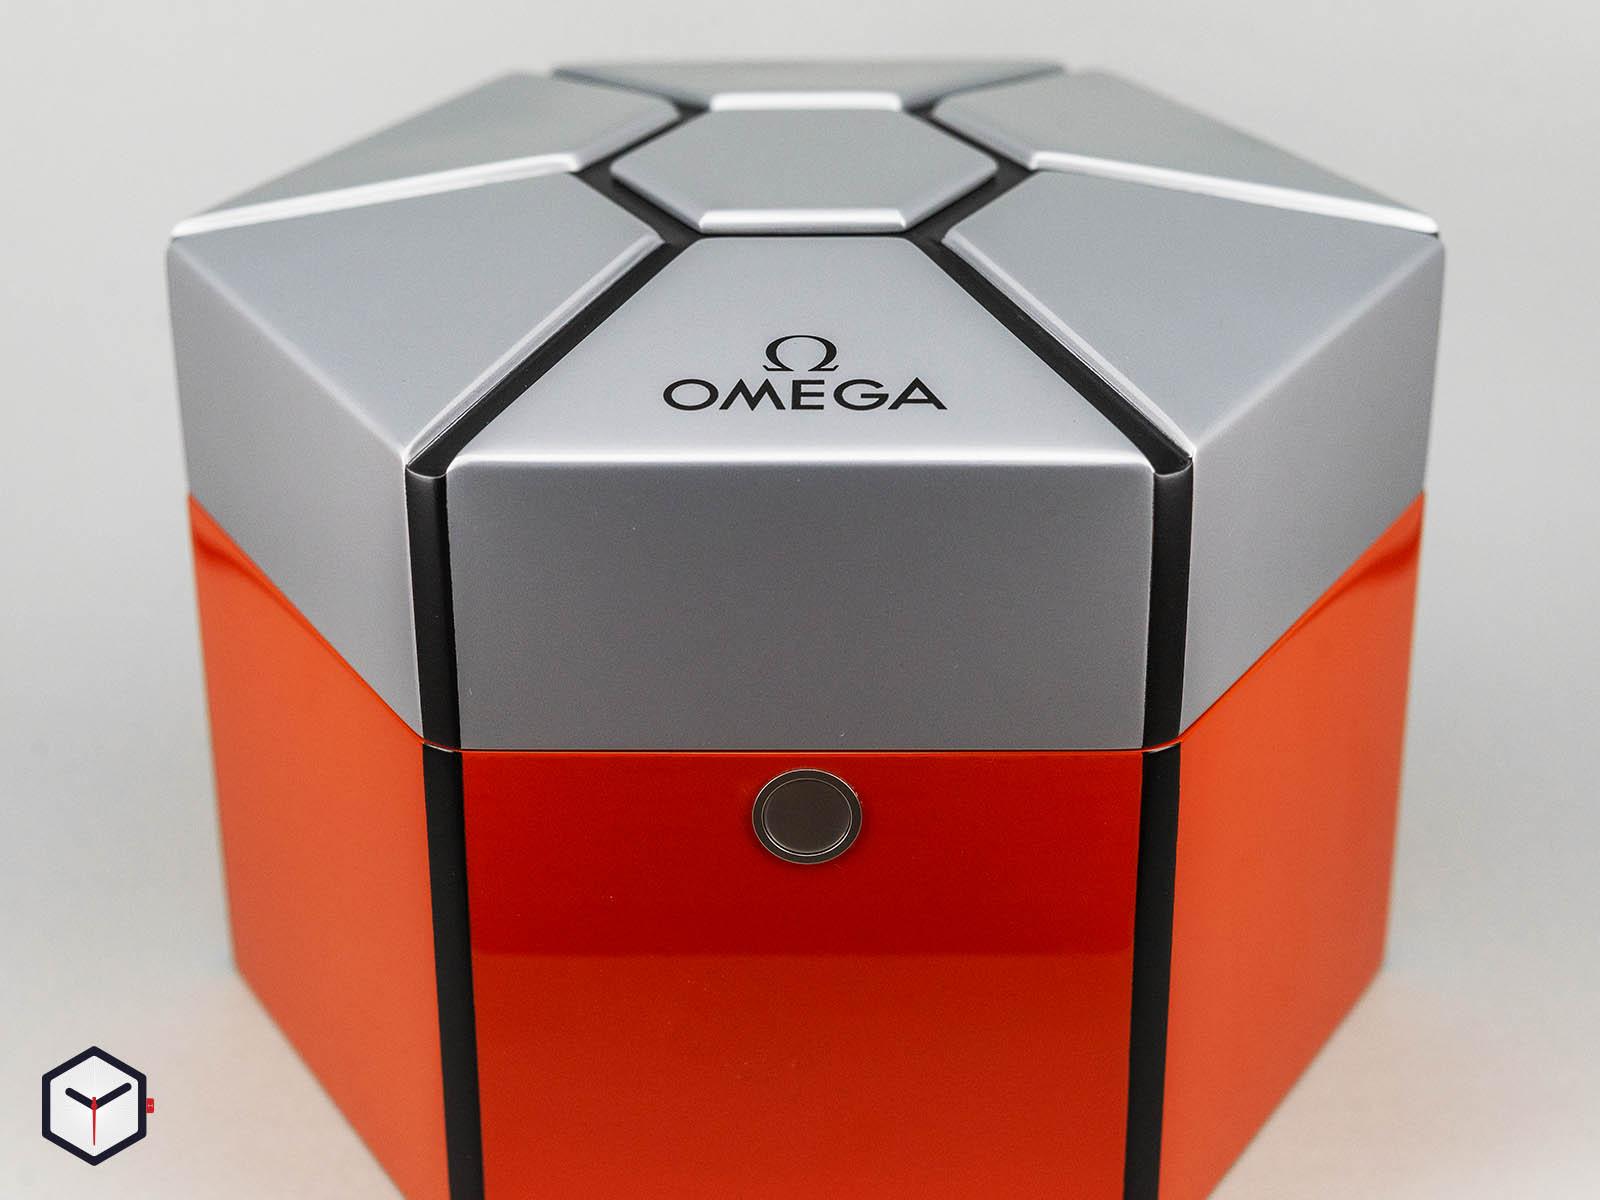 311-12-42-30-01-001-omega-speedmaster-speedy-tuesday-2018-edition-ultraman-14.jpg